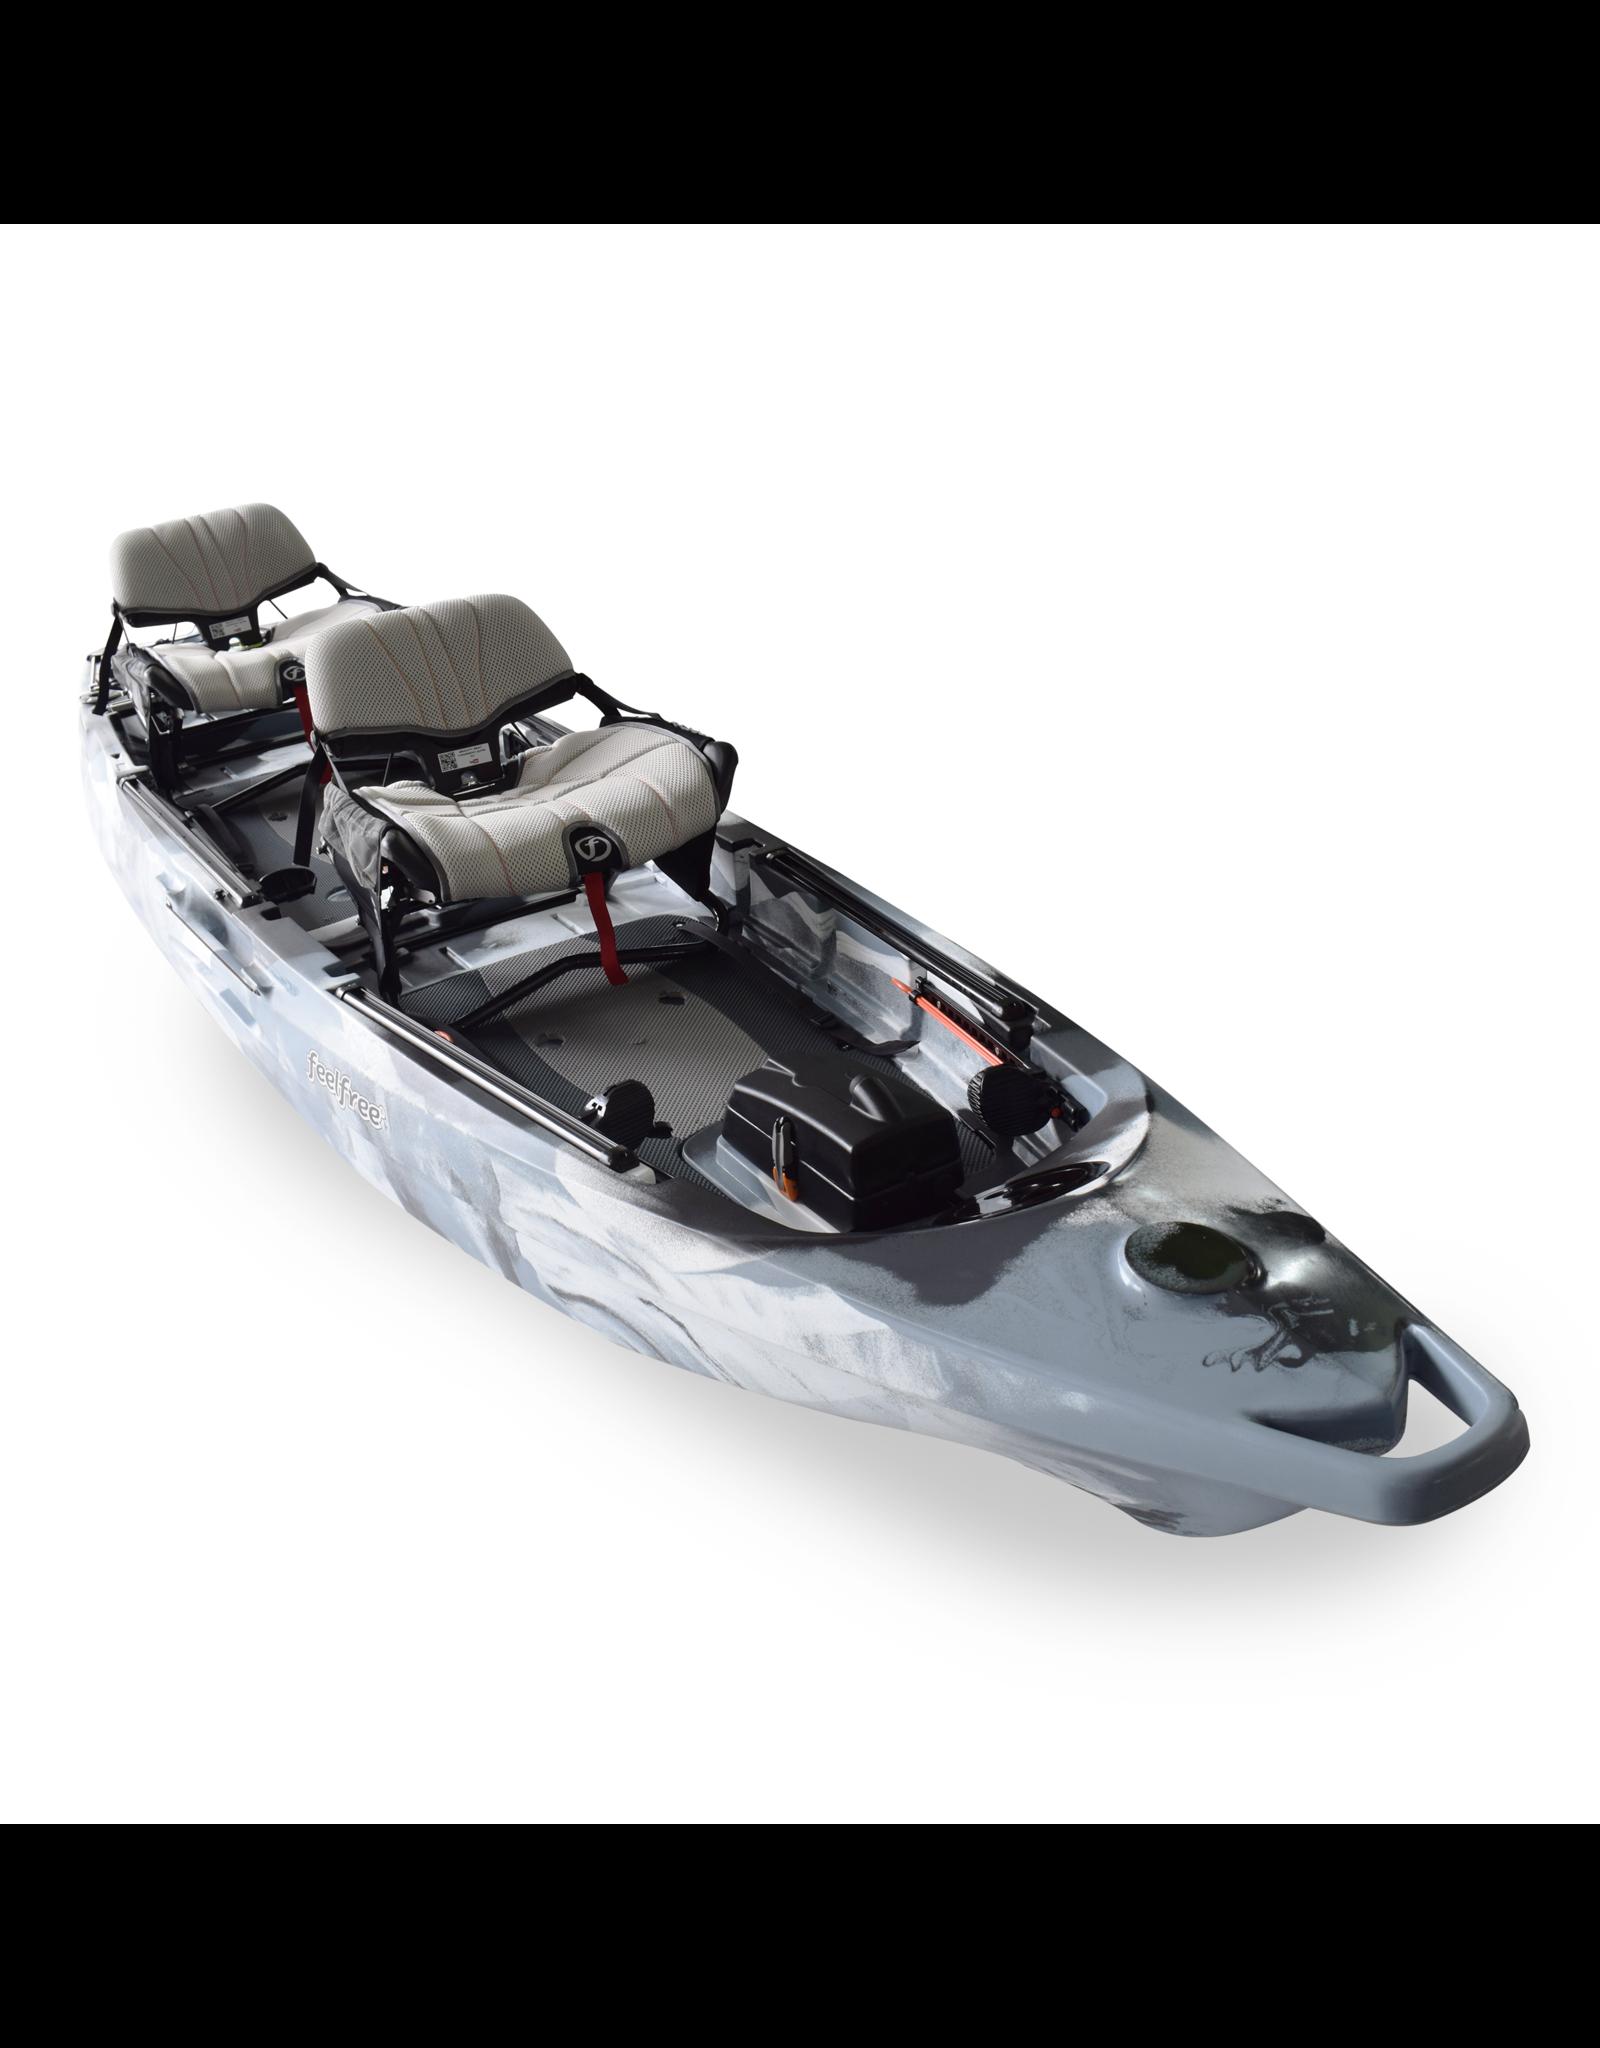 Feelfree Kayaks Feelfree Kayak Lure II (Tandem)